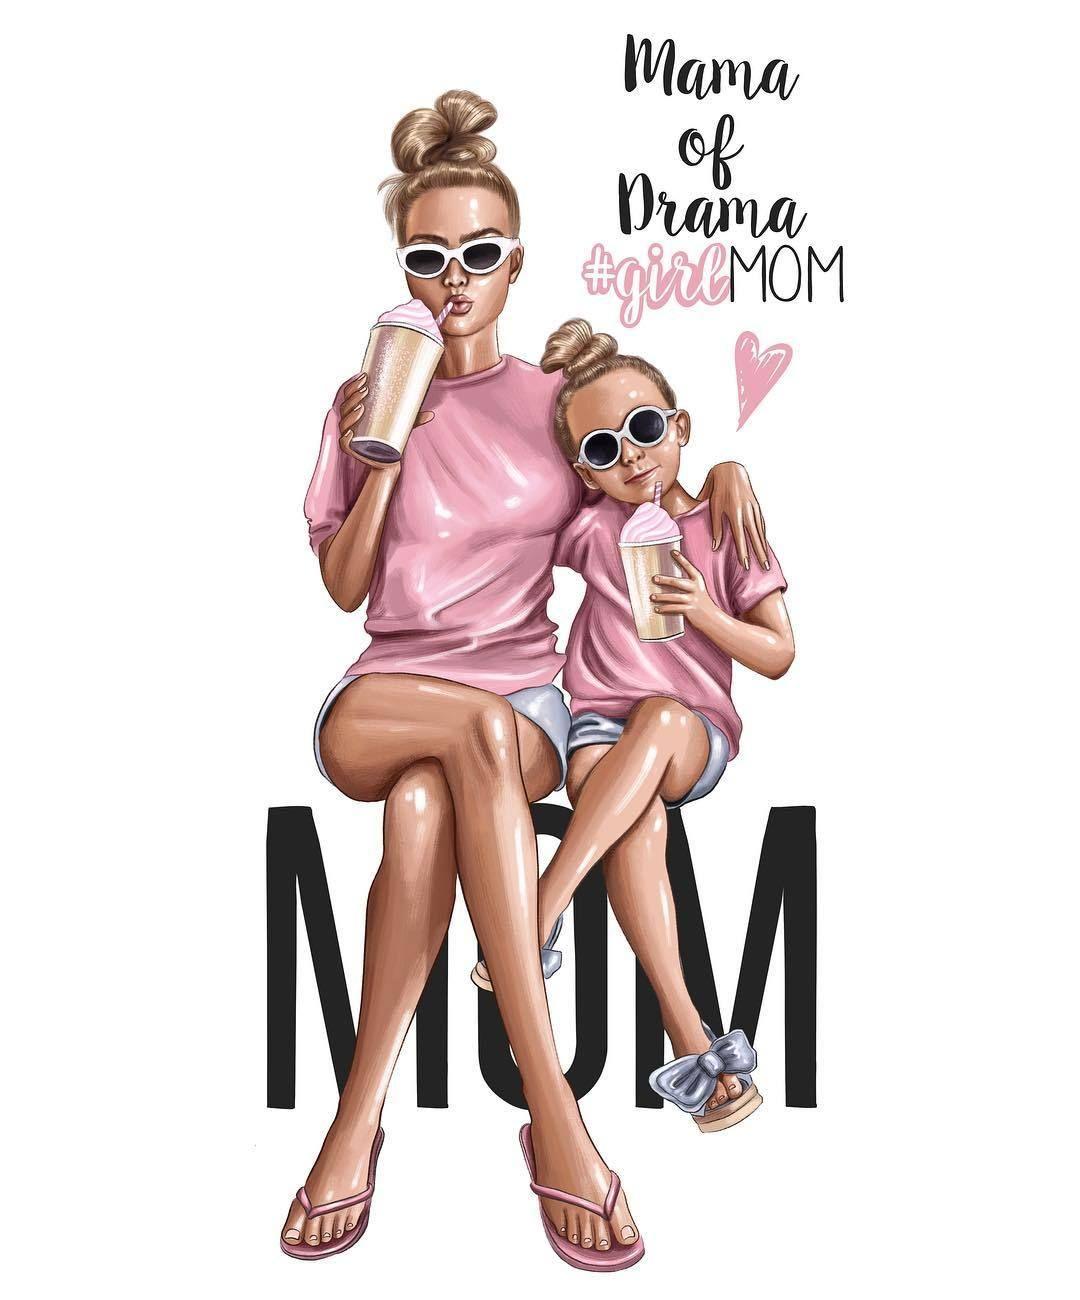 Natalia Vasilyeva Navasyart Fashion Illustrator Anastasia Kosyanova Mother Daughter Art Bff Drawings Mom Art